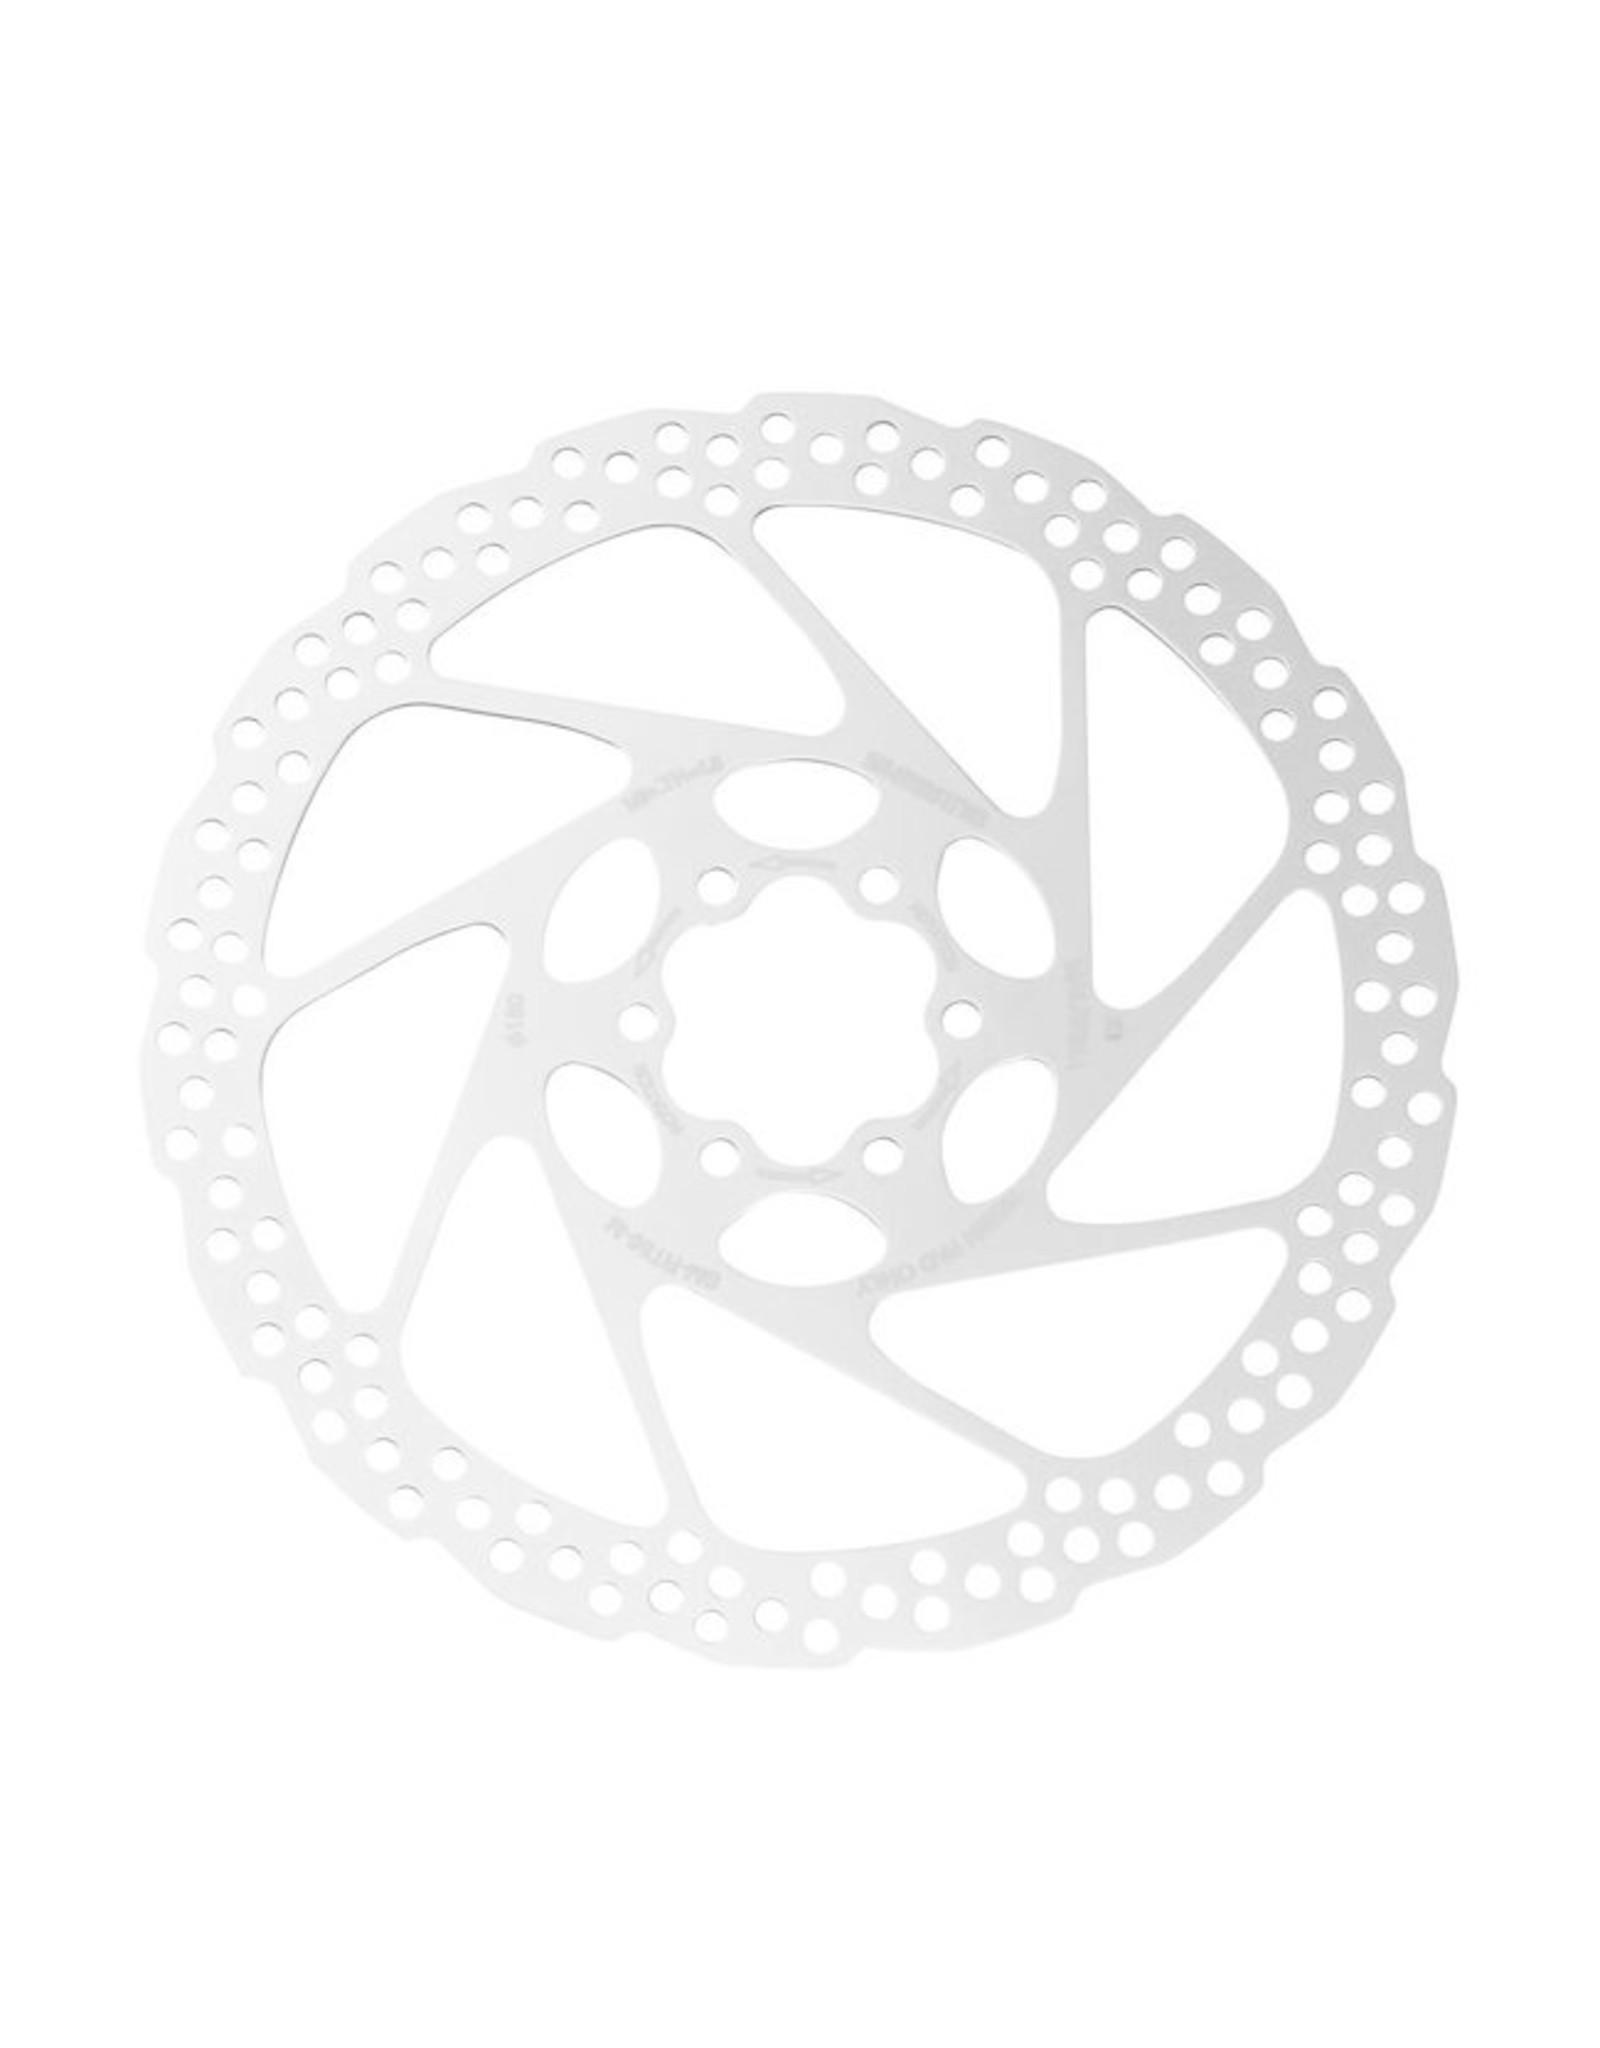 SHIMANO Shimano Disc Brake Rotor SM-RT56 180mm ISO 6B